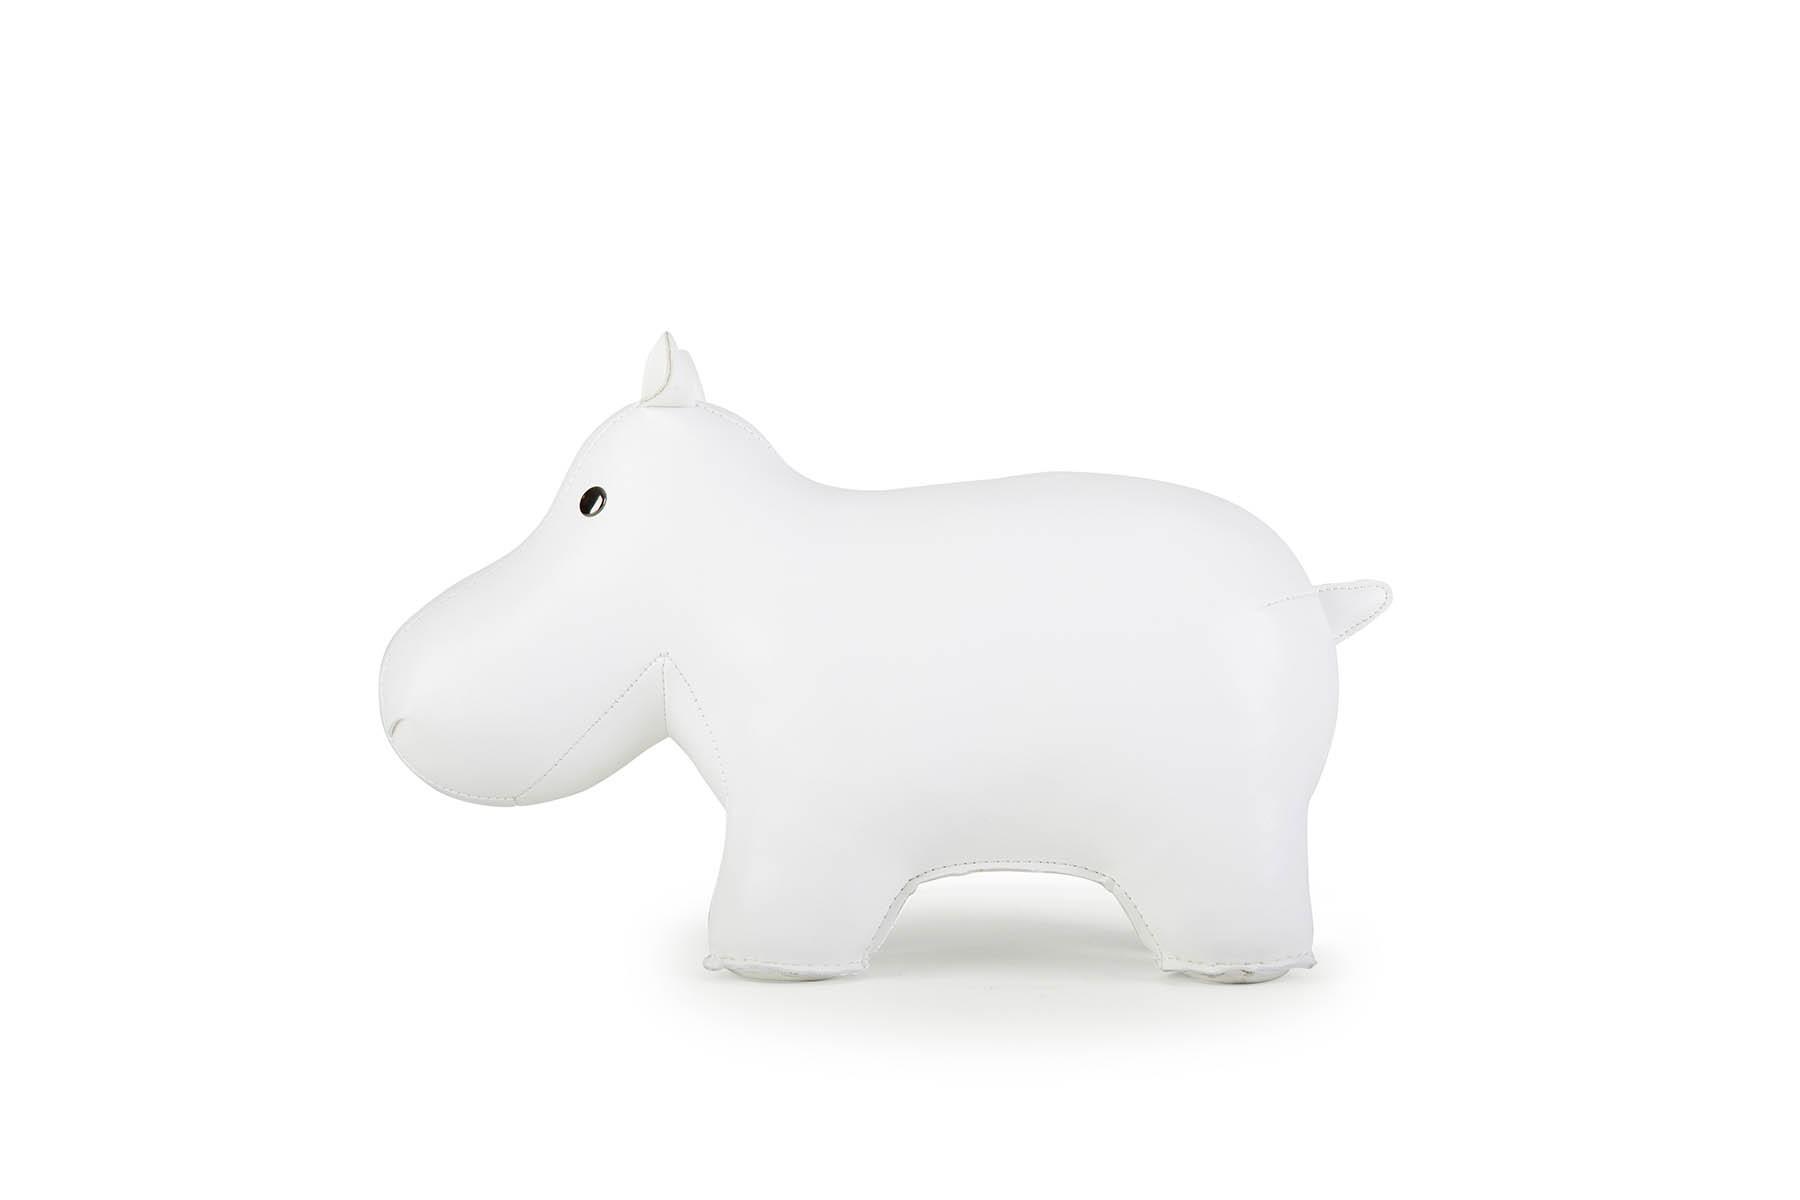 Hippo hippopotame serre livre objet d co for Objet decoration hippopotame